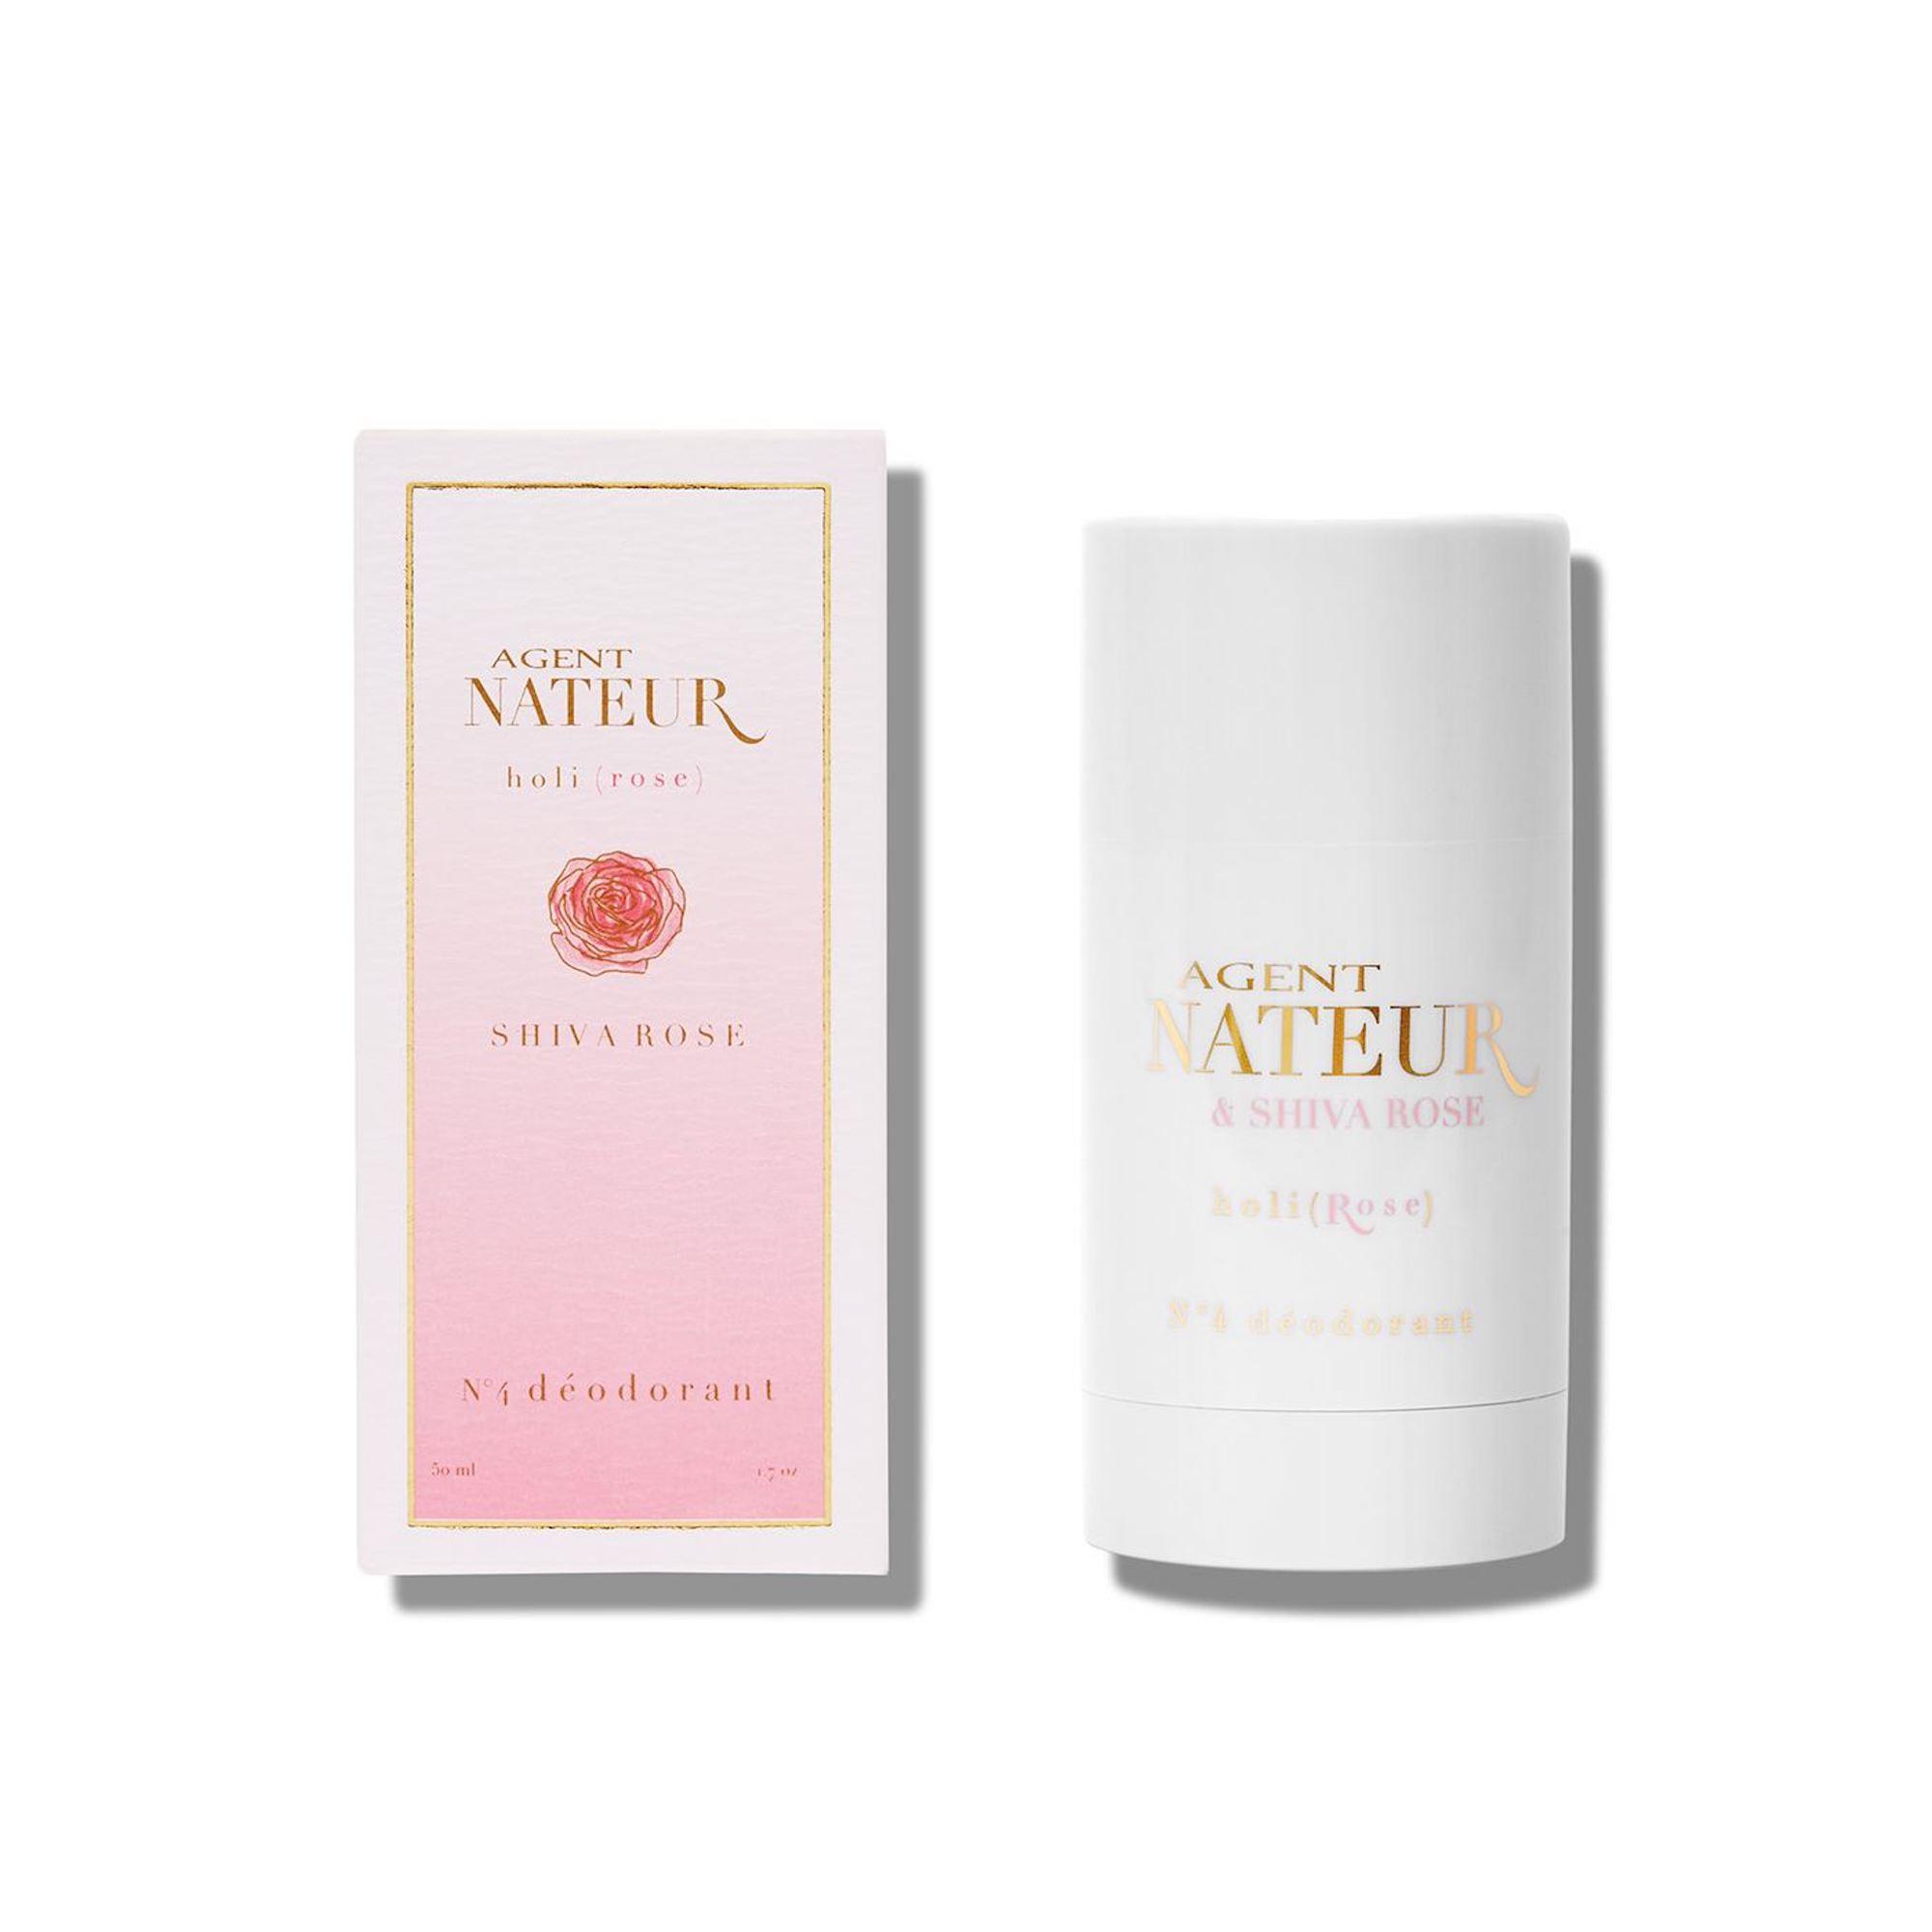 Holi (rose) N4 Deodorant